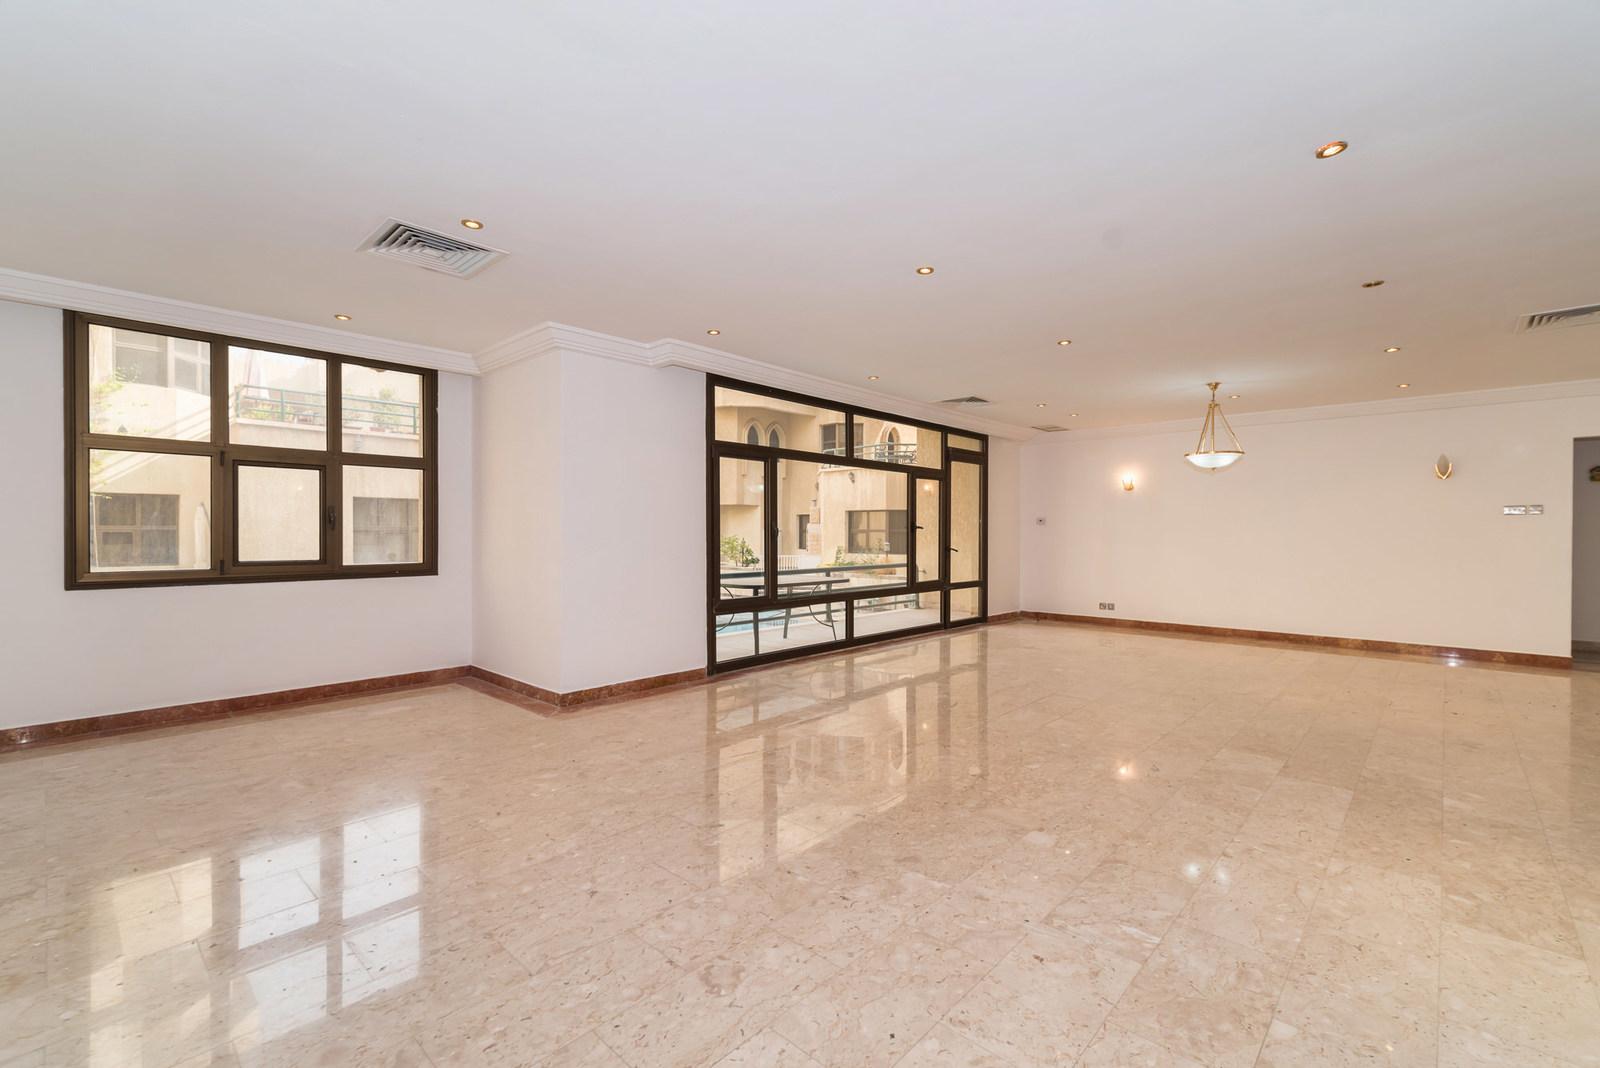 Abu Al Hasania – great, unfurnished, three bedroom apartment w/pool